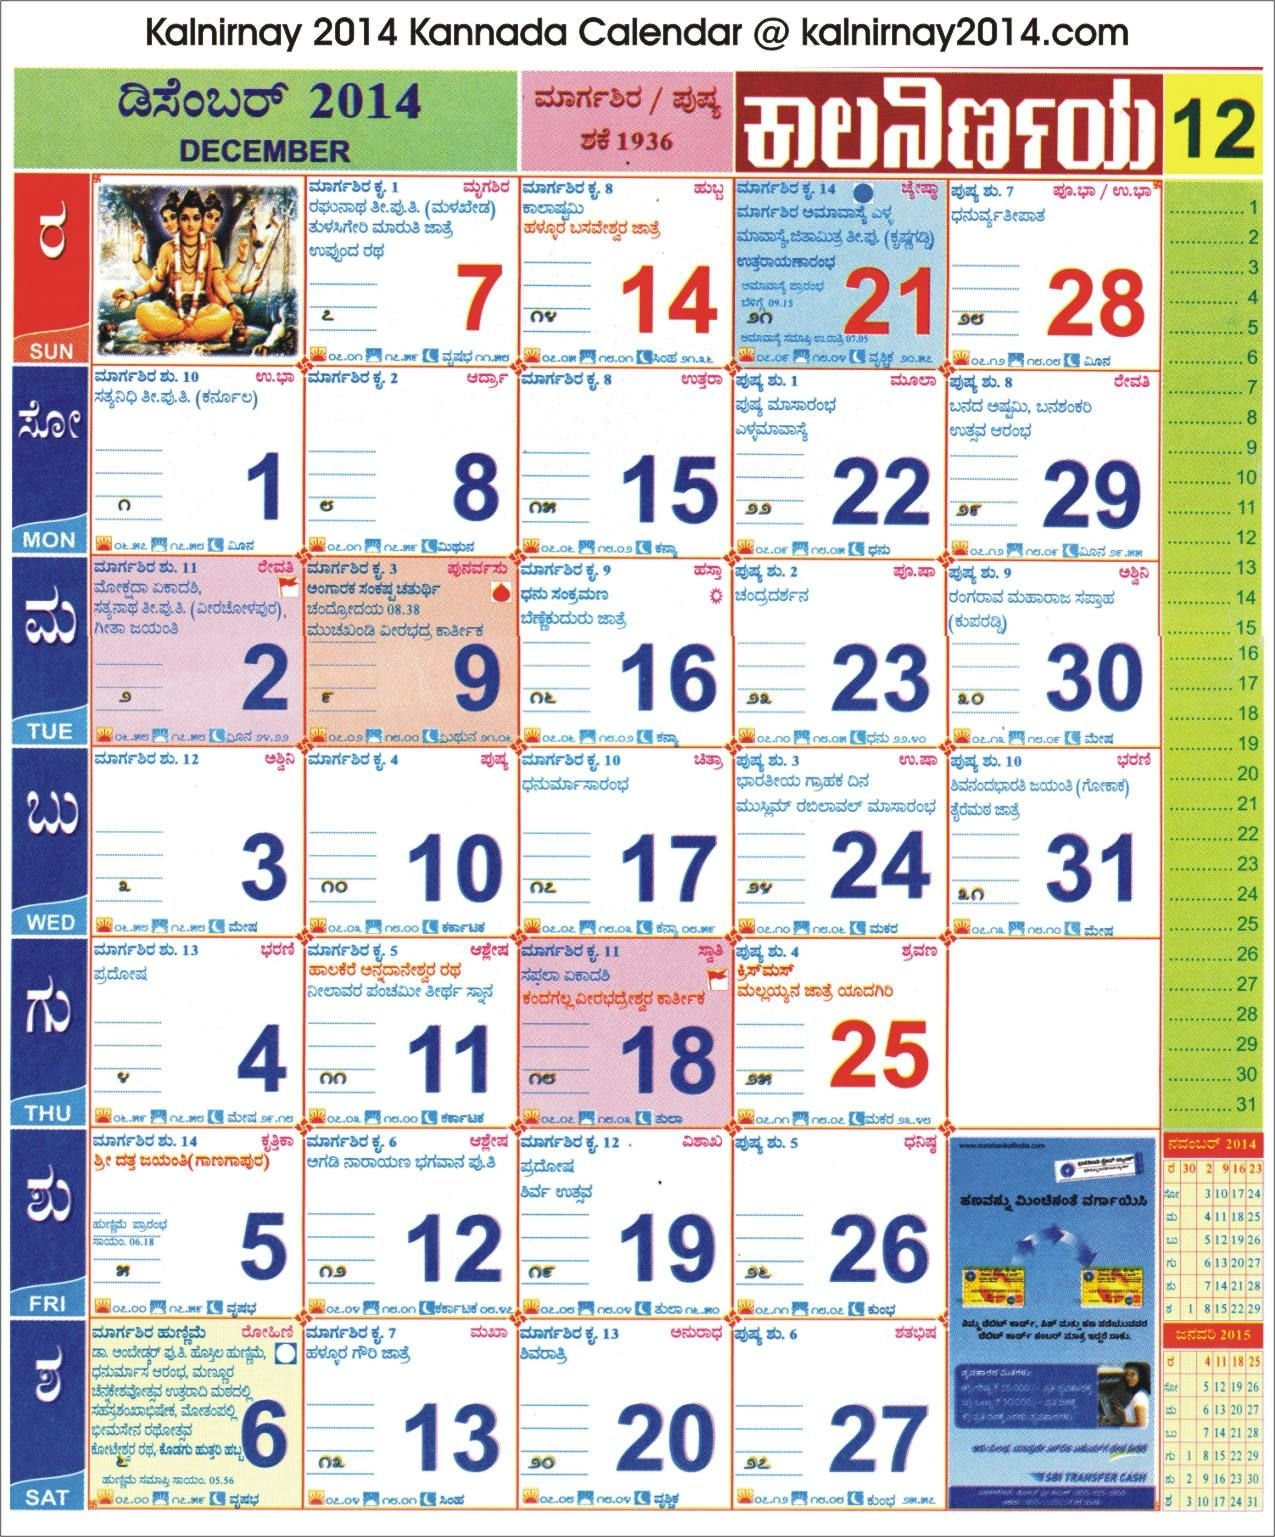 December 2014 Kannada Kalnirnay Calendar | 2014 Kannada Kalnirnay Calendar 2019 Kannada